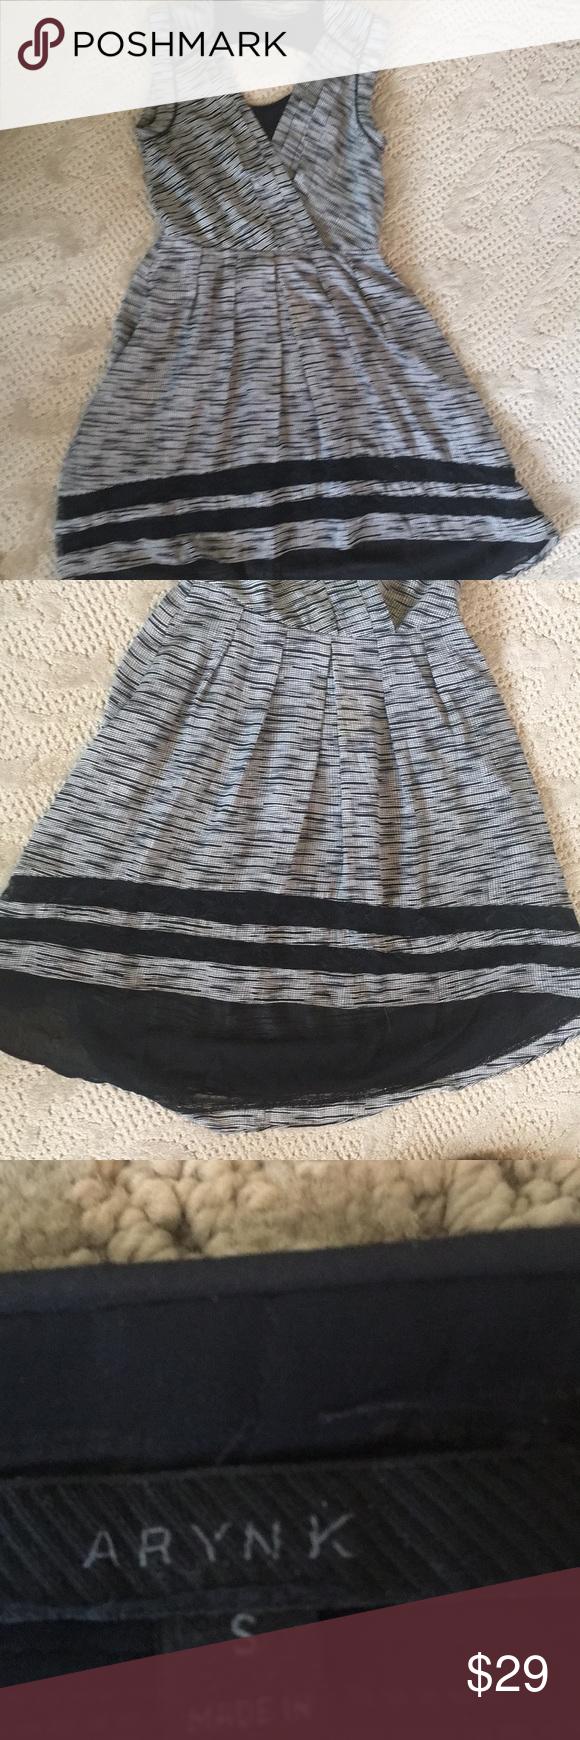 Aryn K lace trimmed dress VGUC. Open back. Surplice neckline. Pleated skirt with longer, rounded hem in back. Aryn K Dresses Asymmetrical